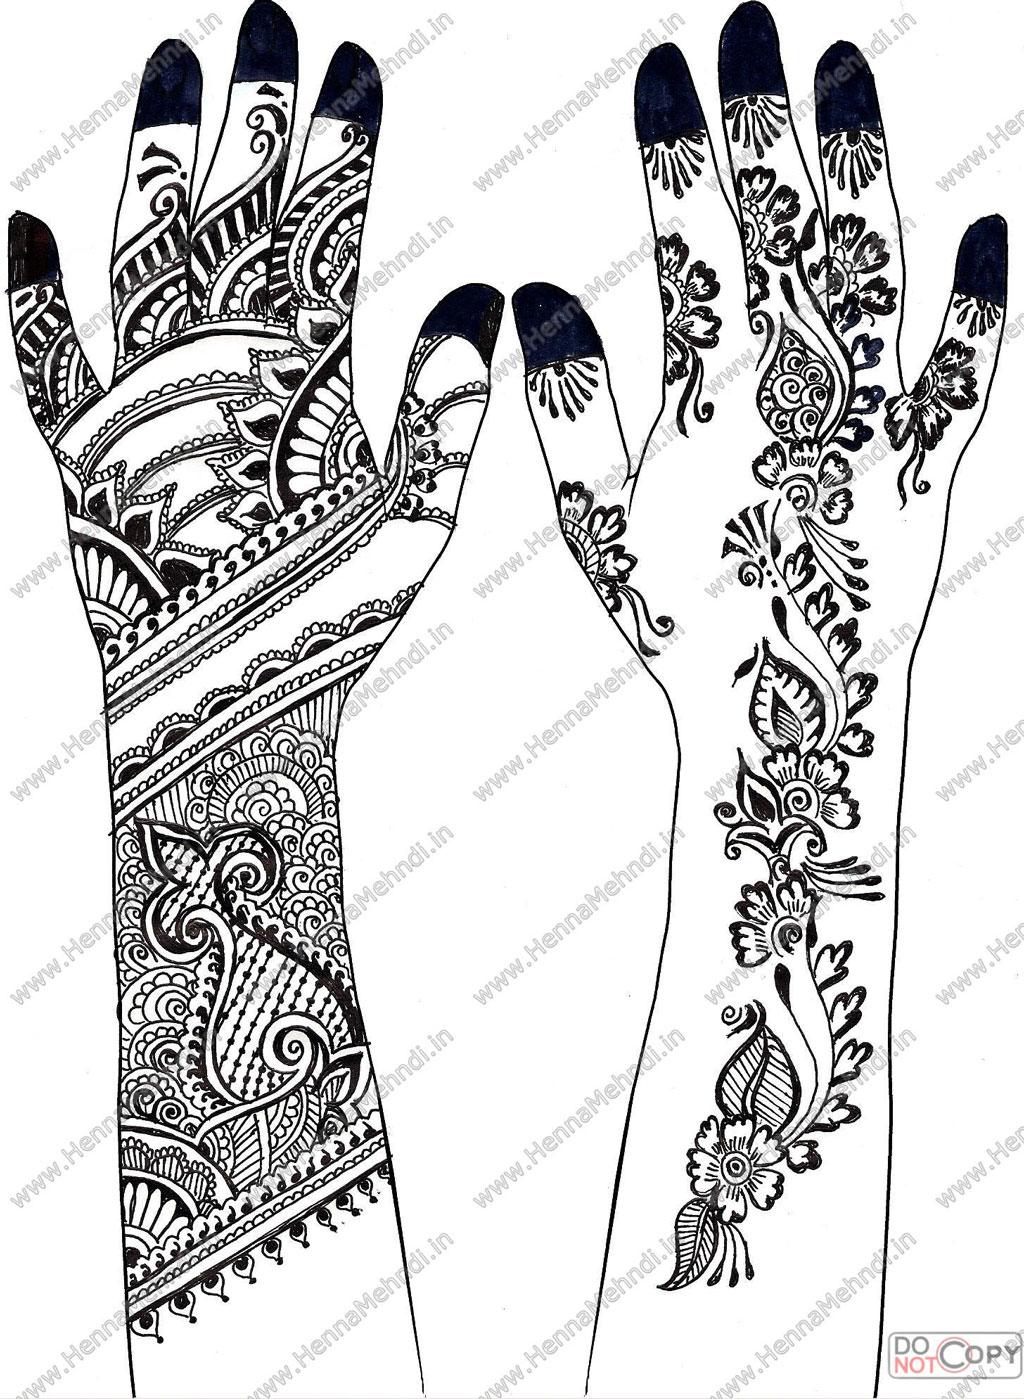 Henna Mehndi Designs-9 by hinasabreenArabic Mehendi Designs On Paper